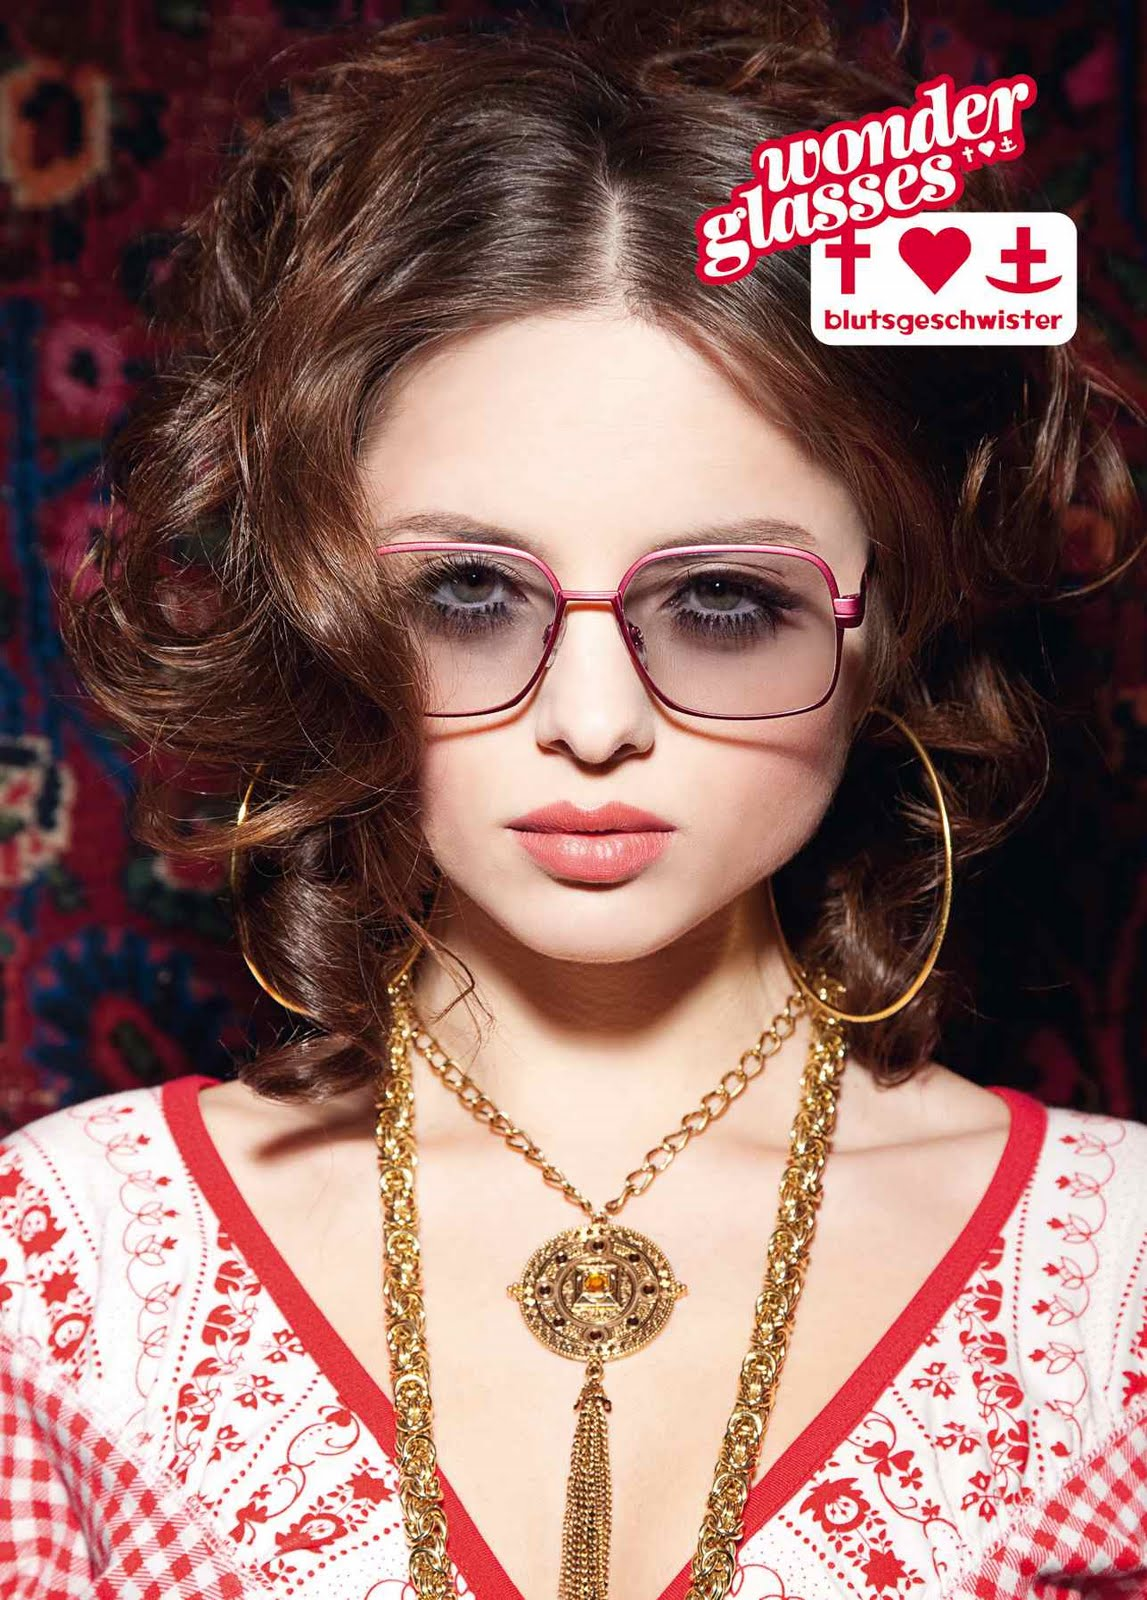 Wonderglasses brillen glasses lunettes